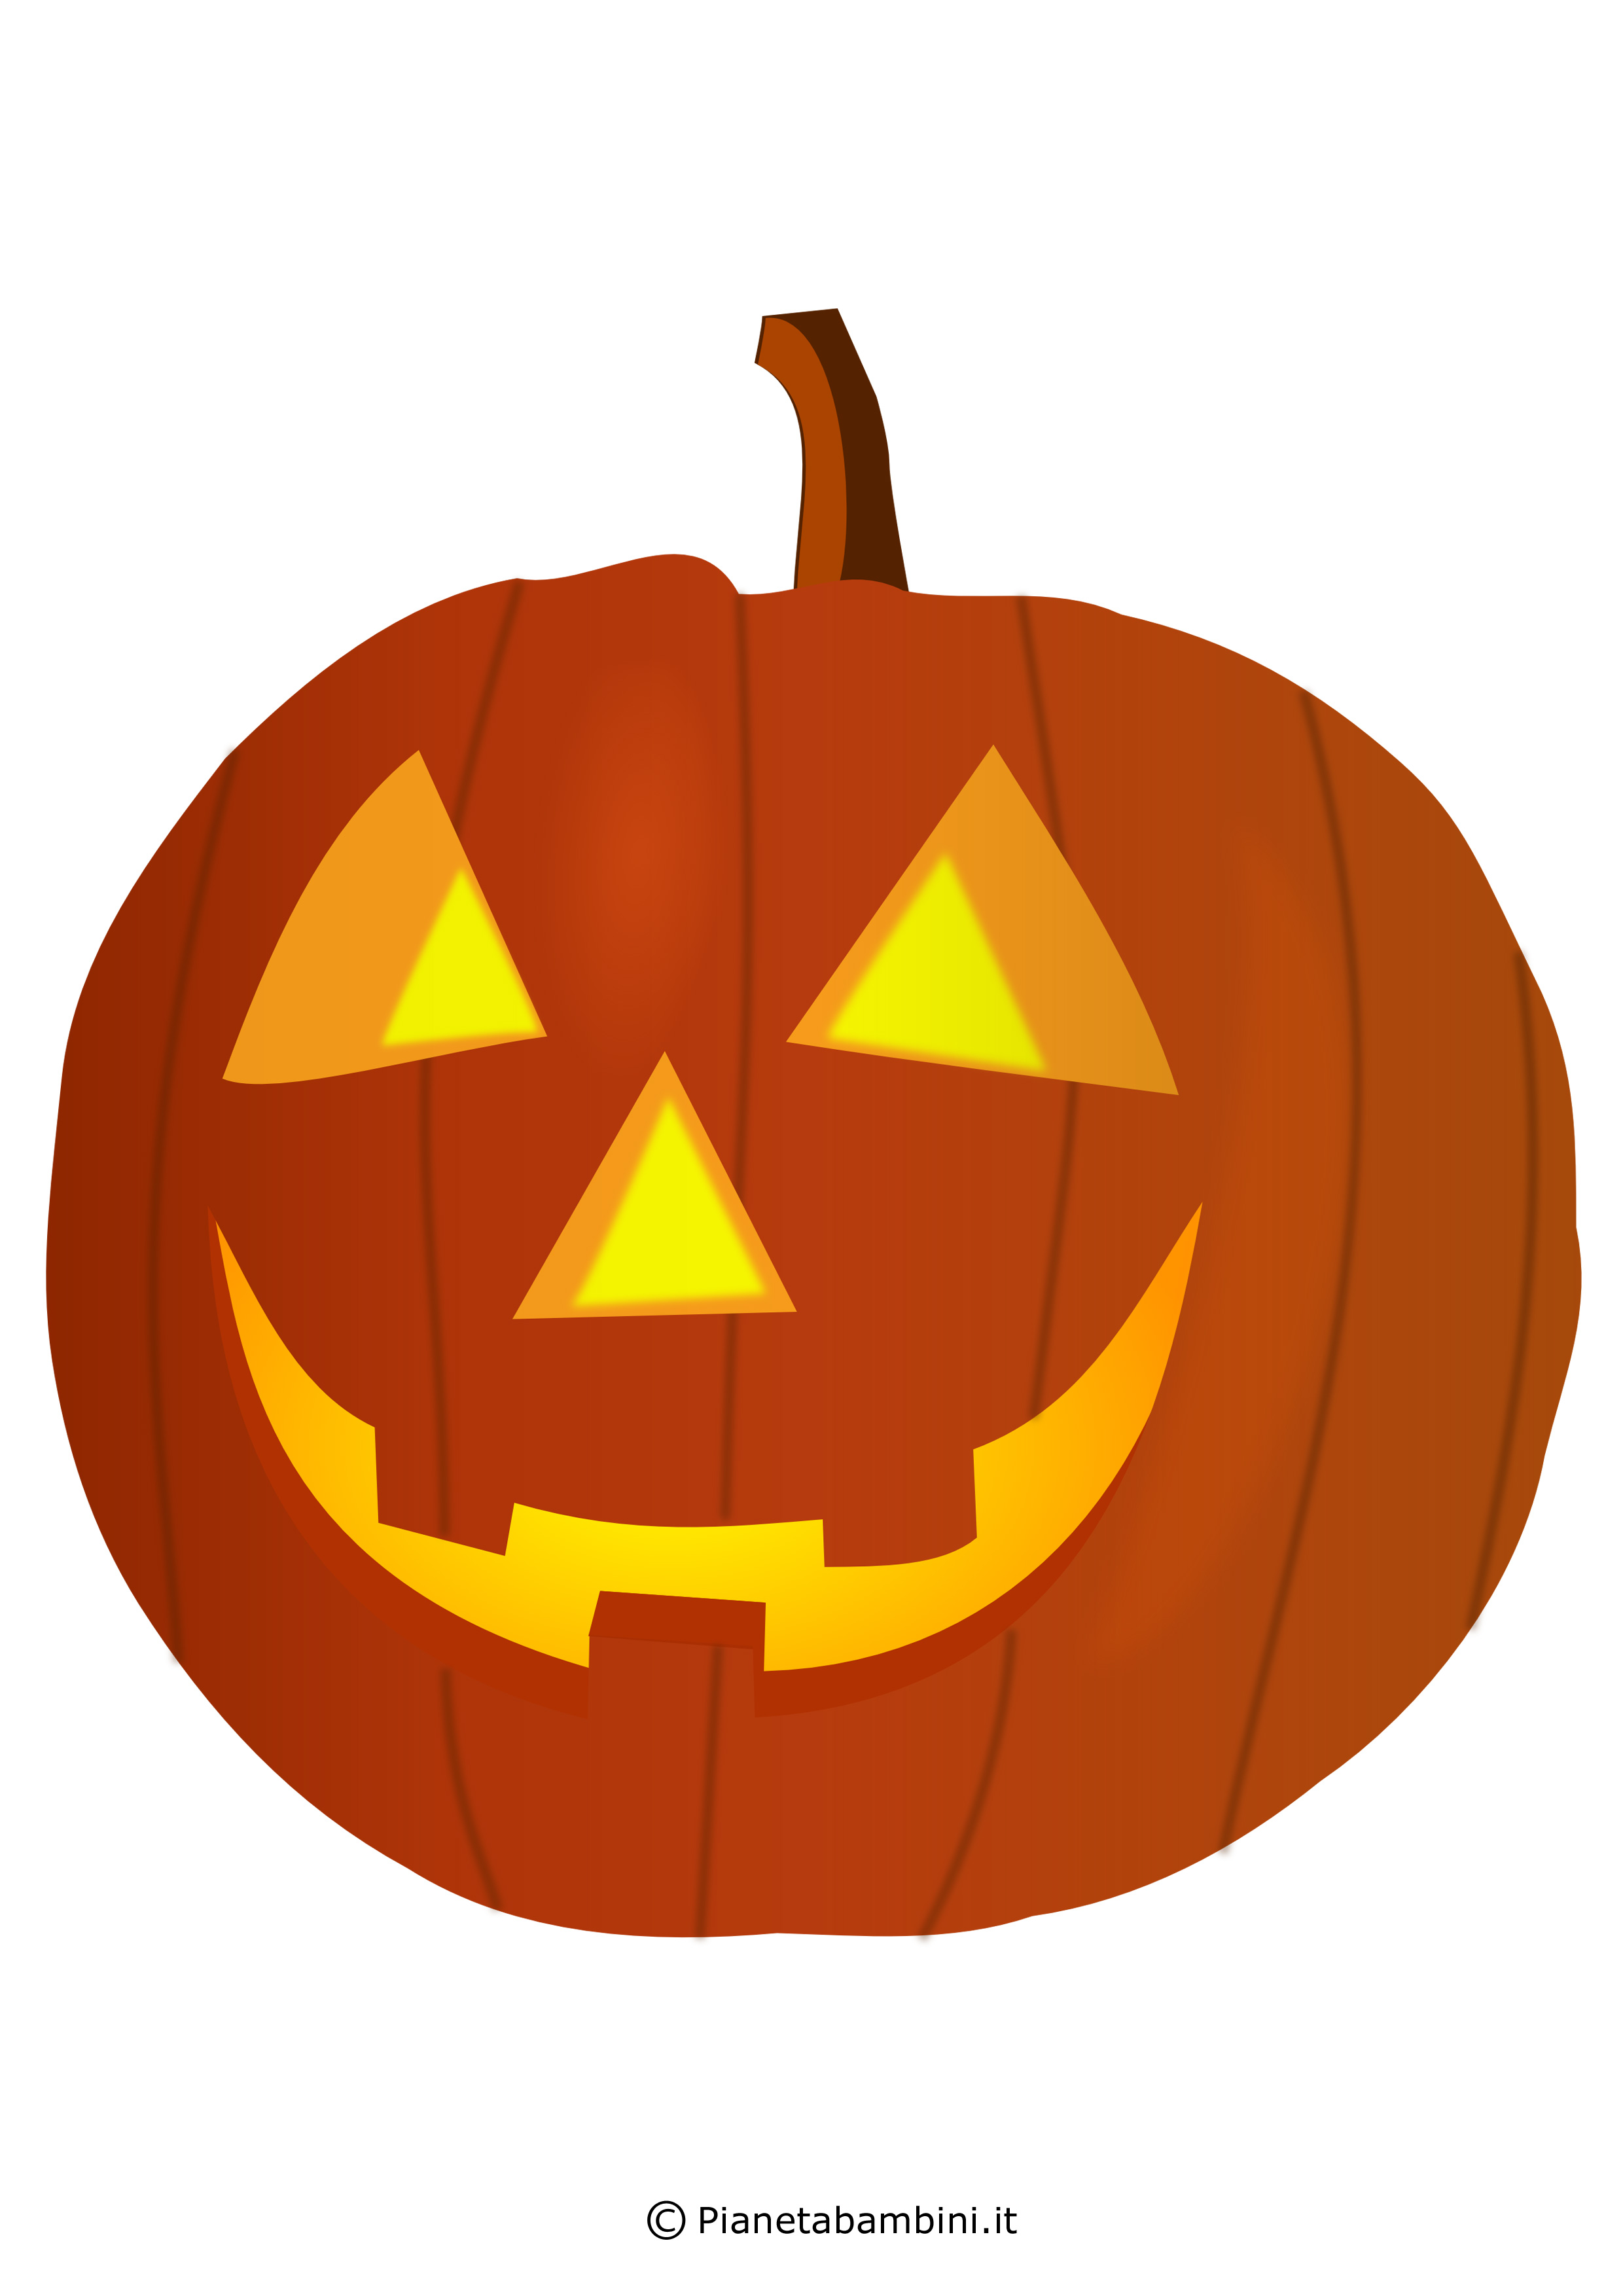 Immagini di zucche di halloween da stampare e ritagliare for Immagini zucca di halloween